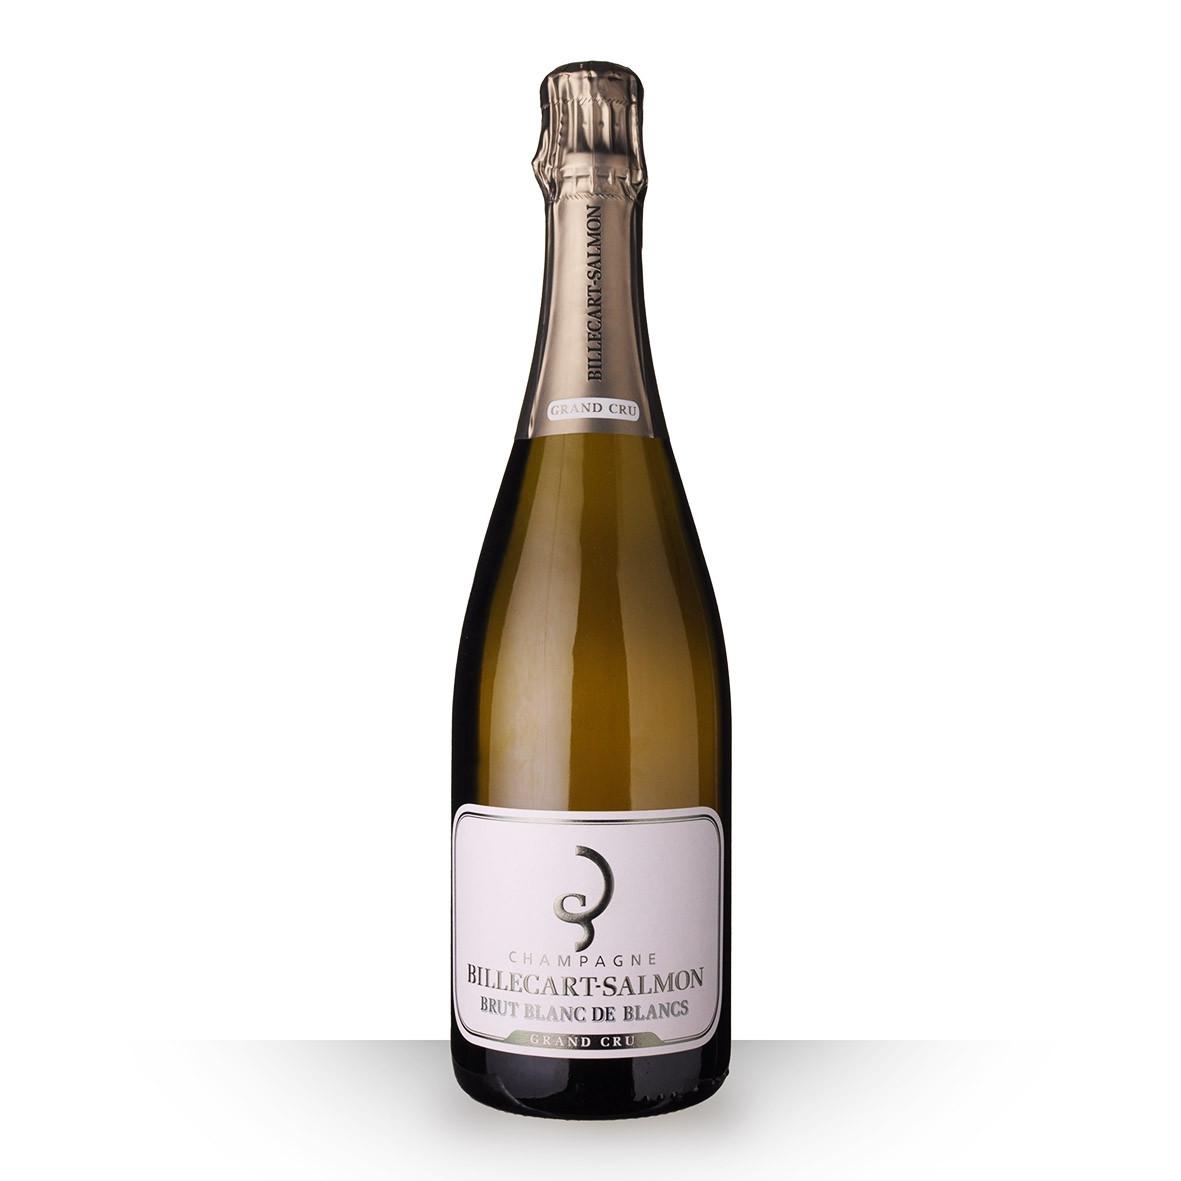 Champagne Billecart-Salmon Blanc de Blancs 75cl www.odyssee-vins.com